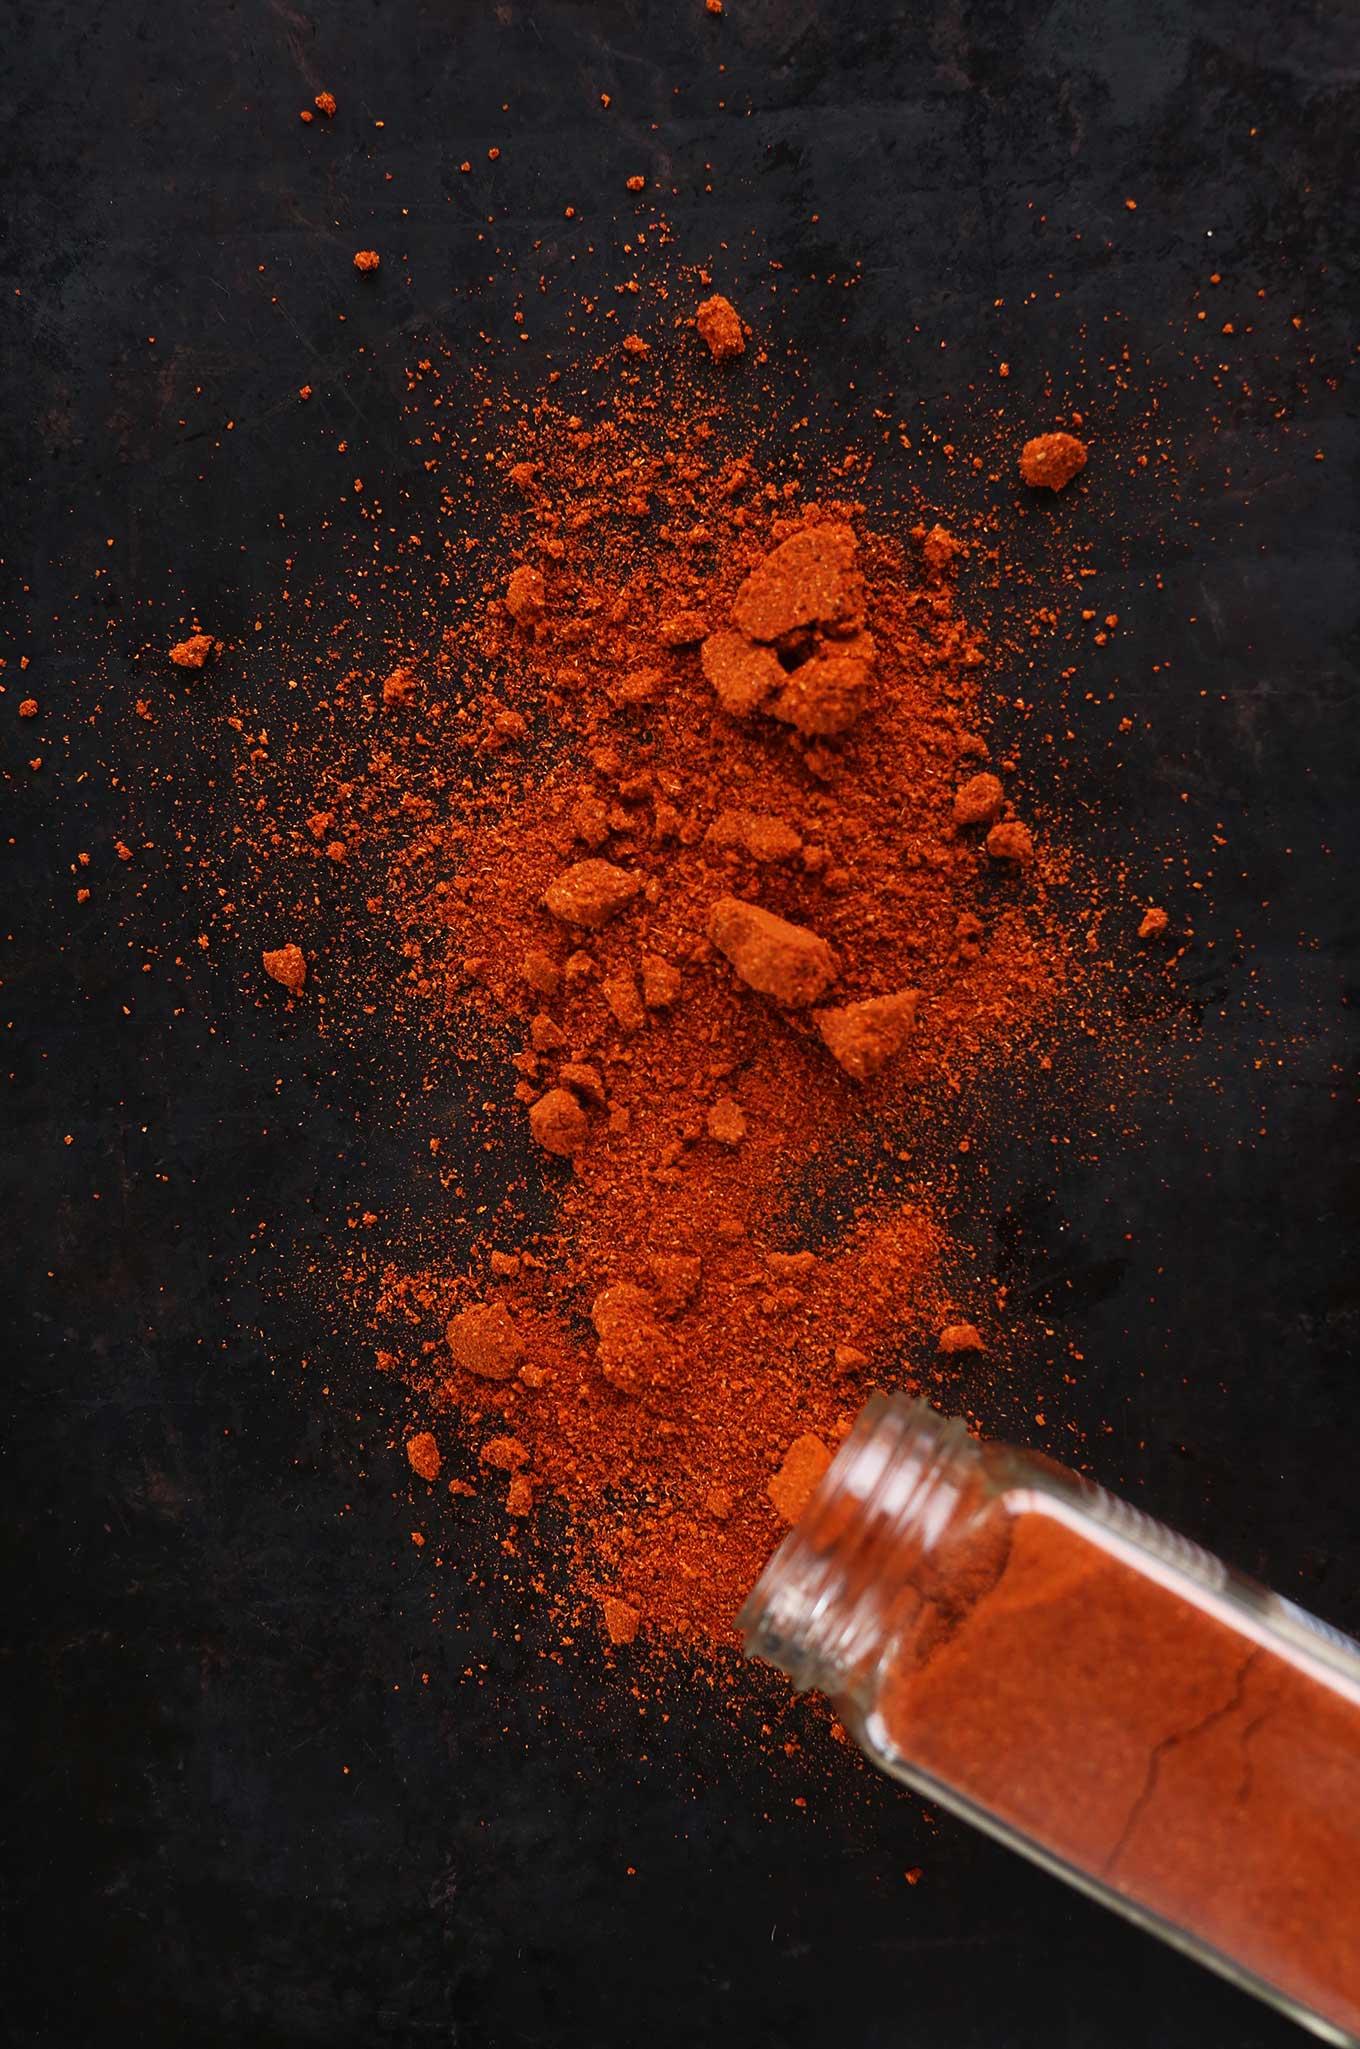 Jar of Masala Spice Blend